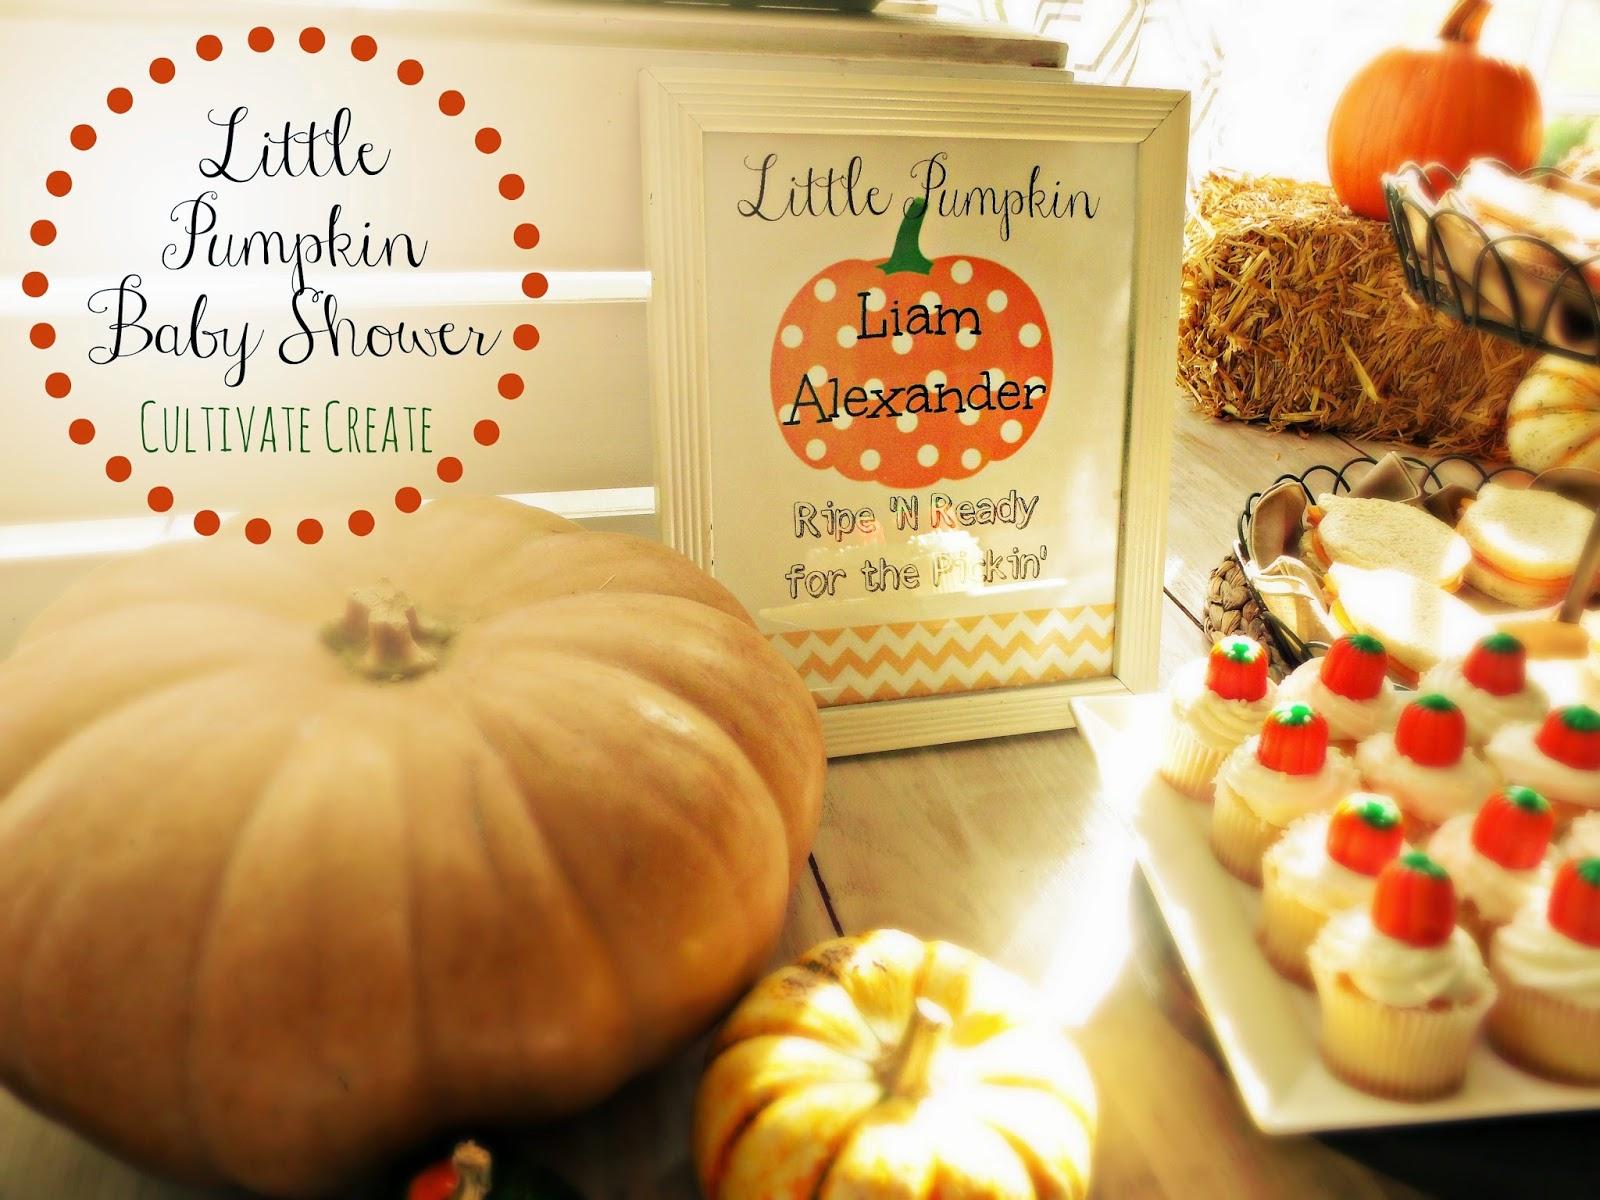 cultivate create little pumpkin baby shower